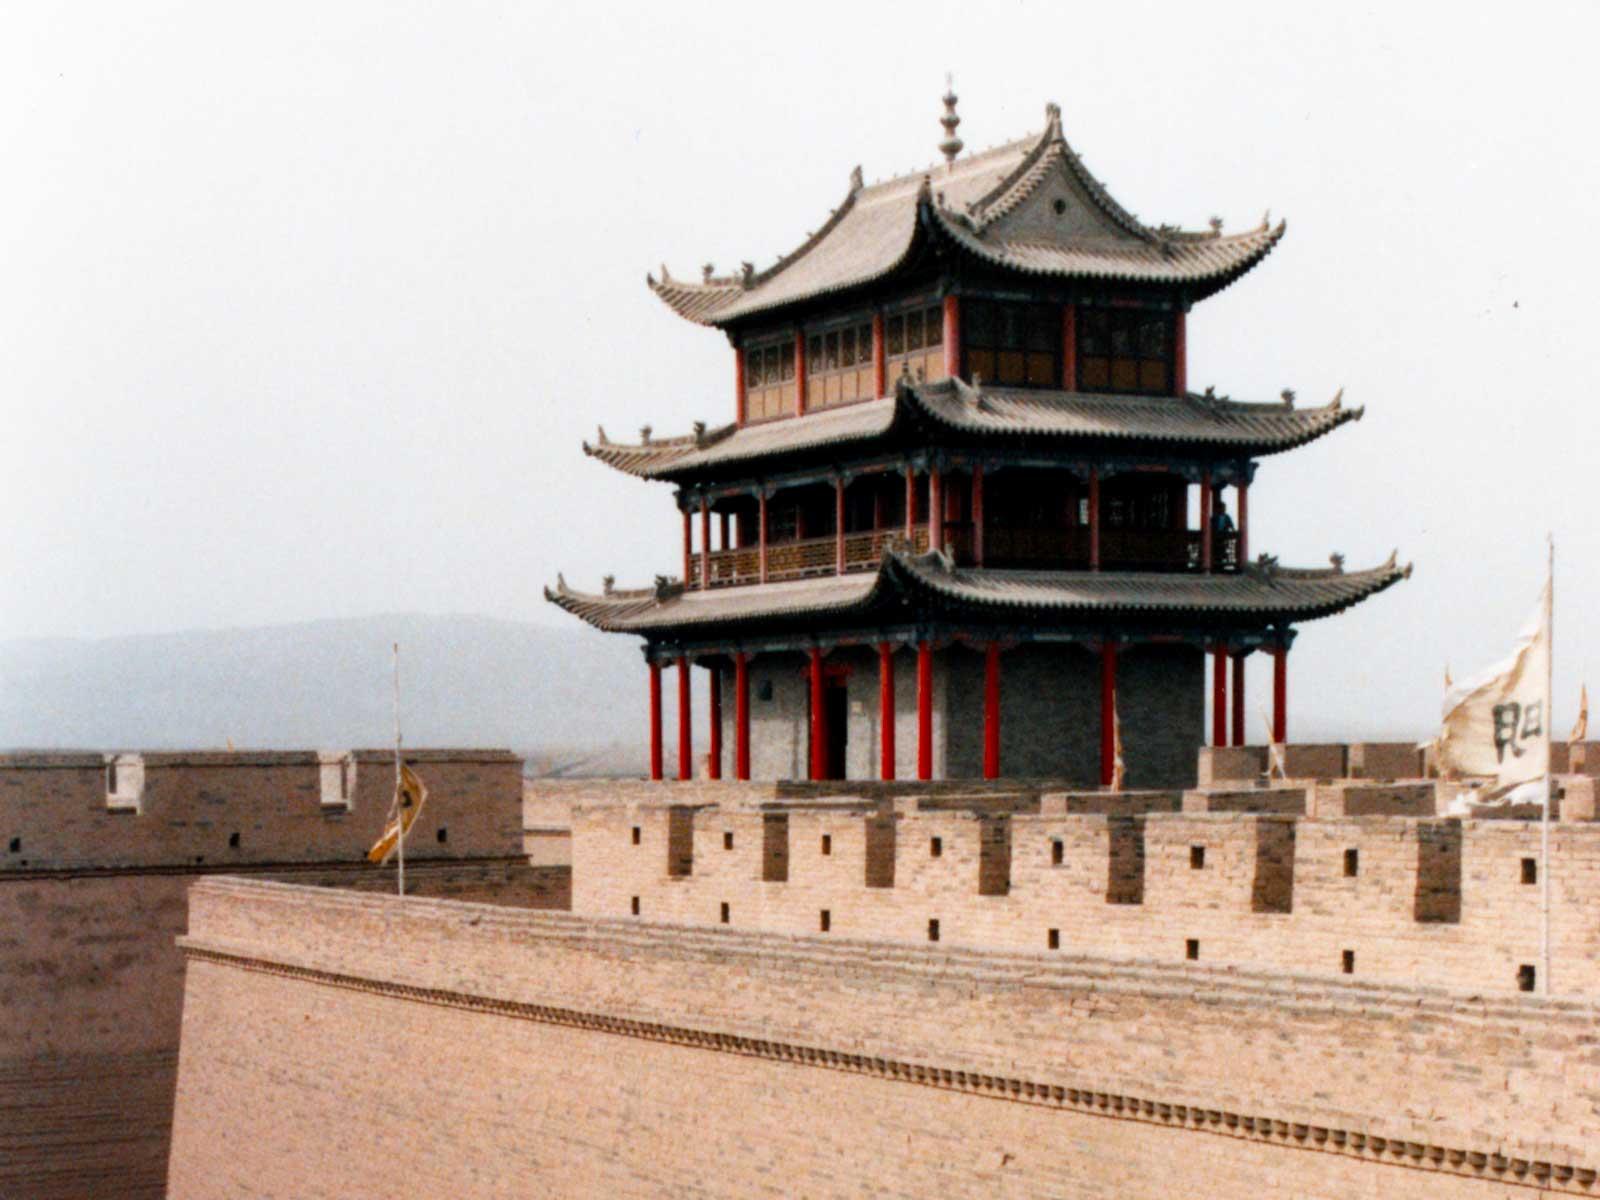 Jiayuguan Great Wall - Eastern Civilization - 1995 China Culture Study Tour - Silk Road Photo Journal - Steven Andrew Martin